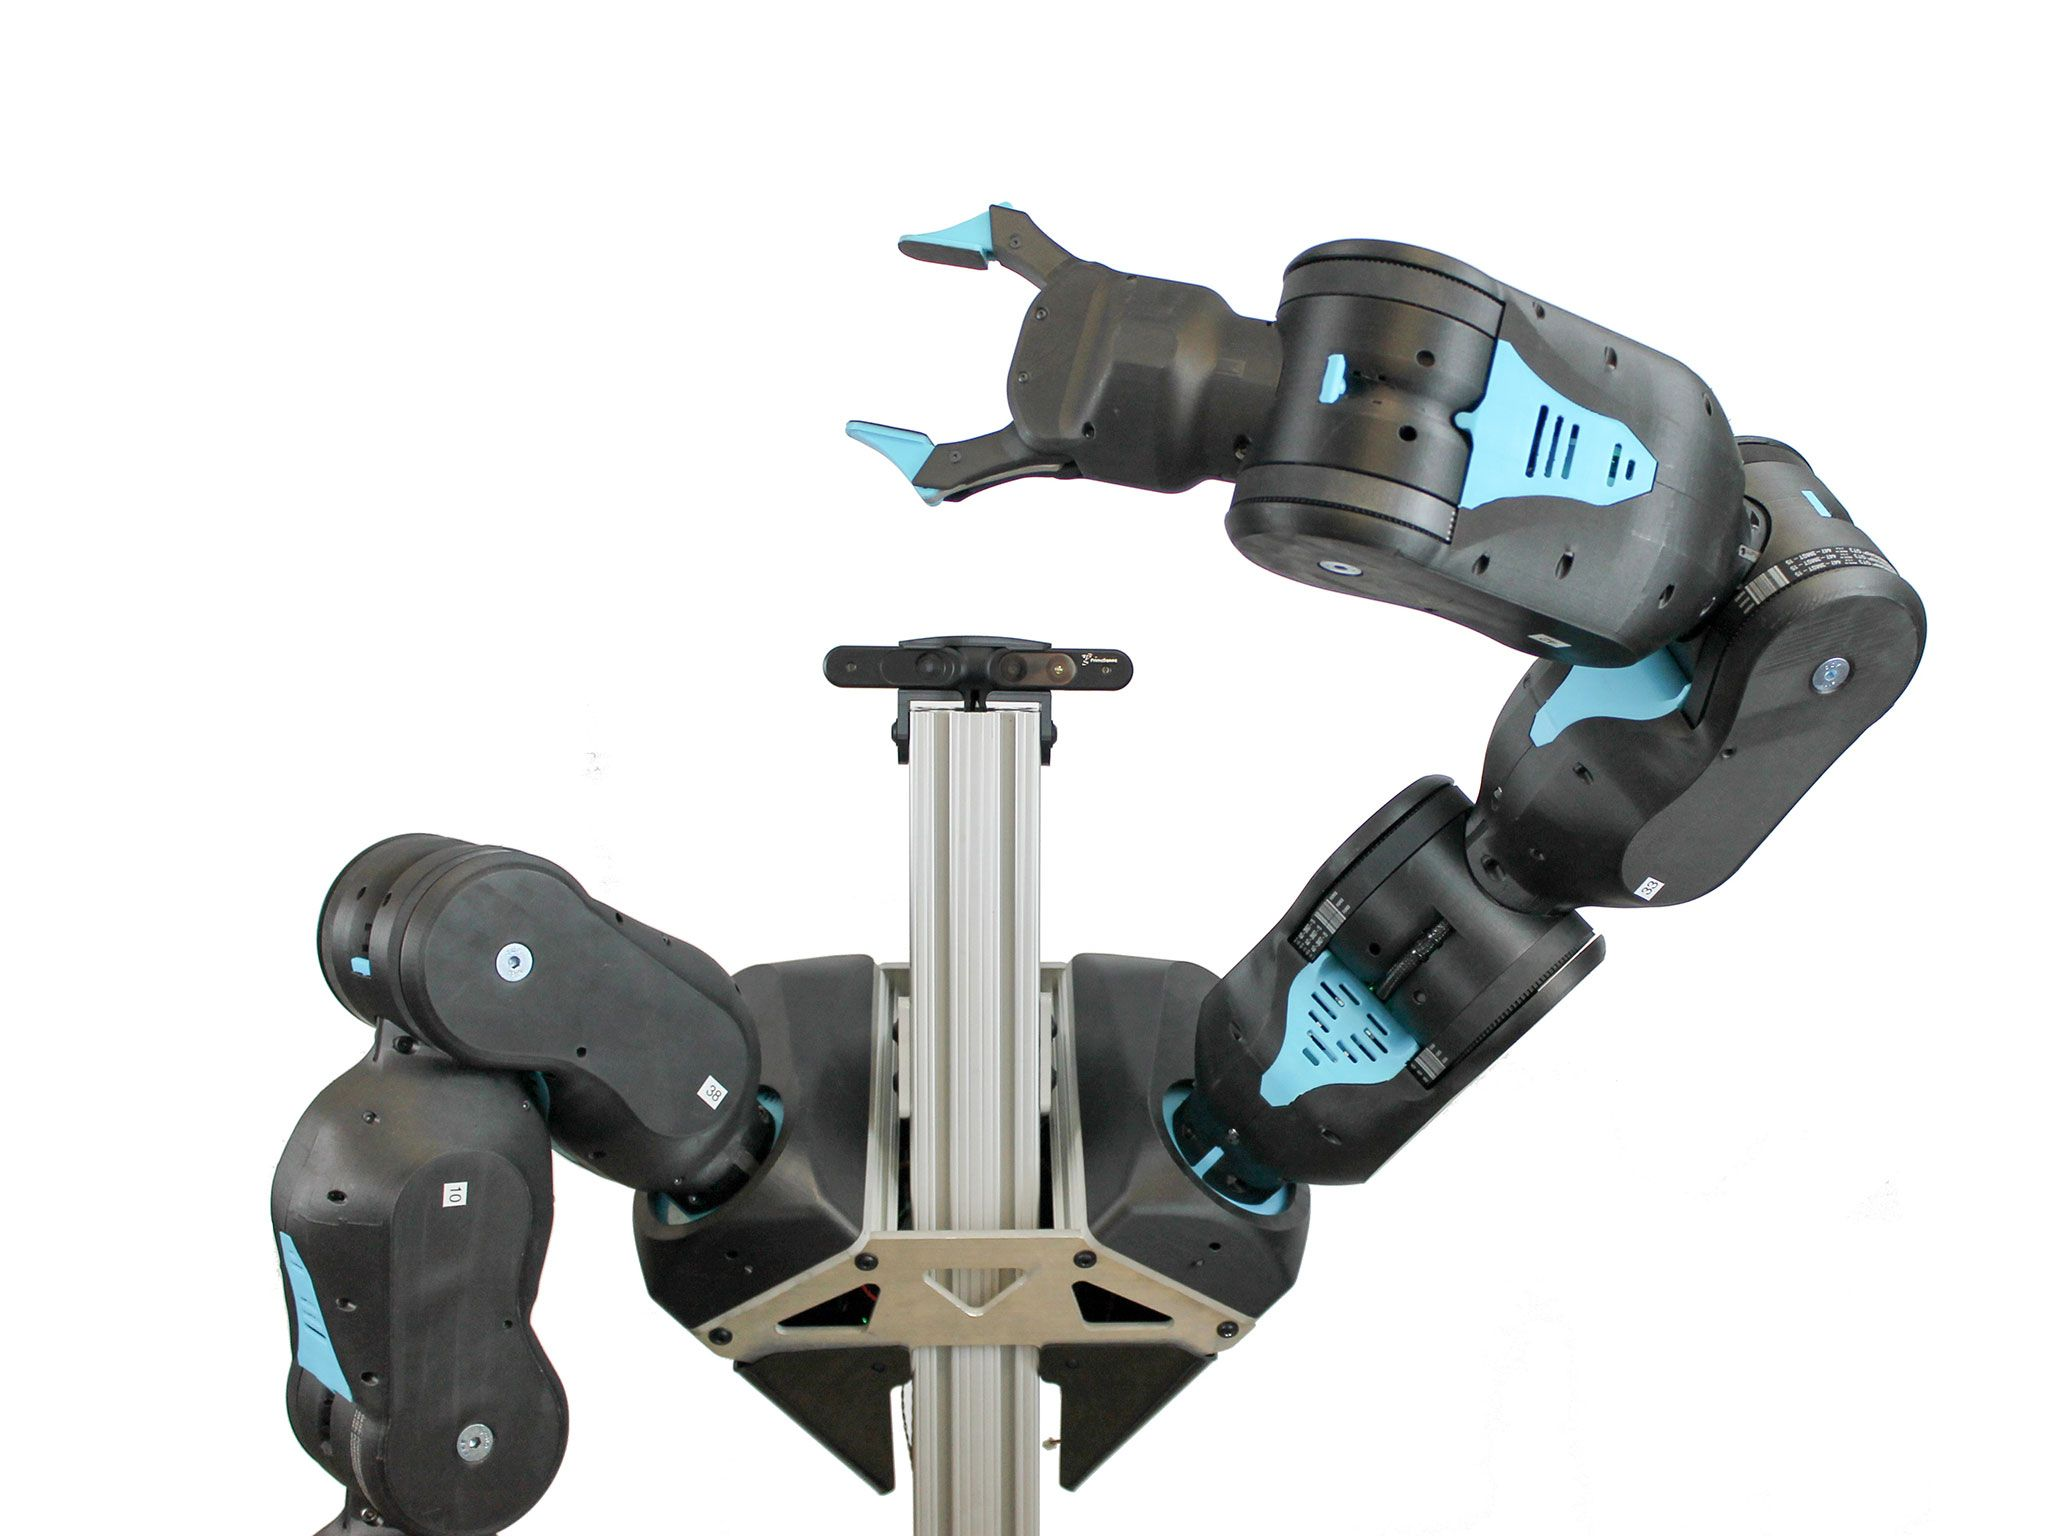 UC Berkeley Blue robot arm